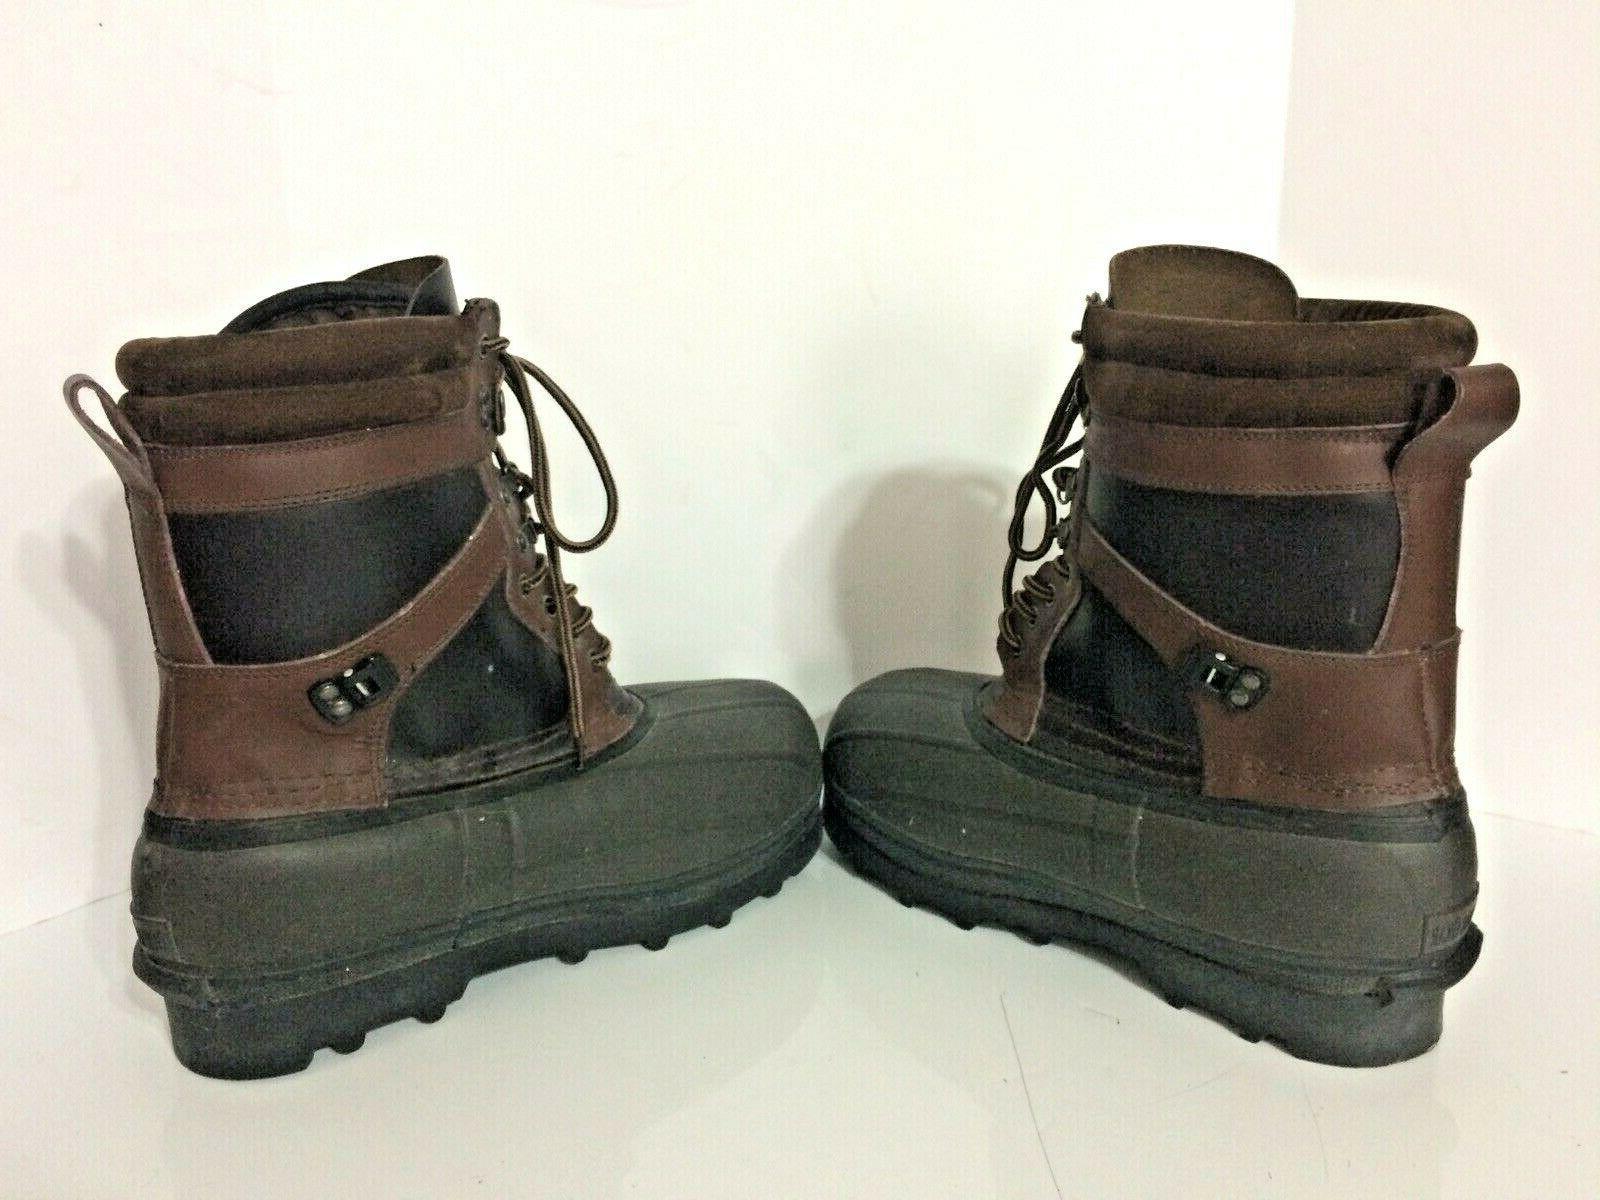 Tinsulate Waterproof Hunting Hiking - 8